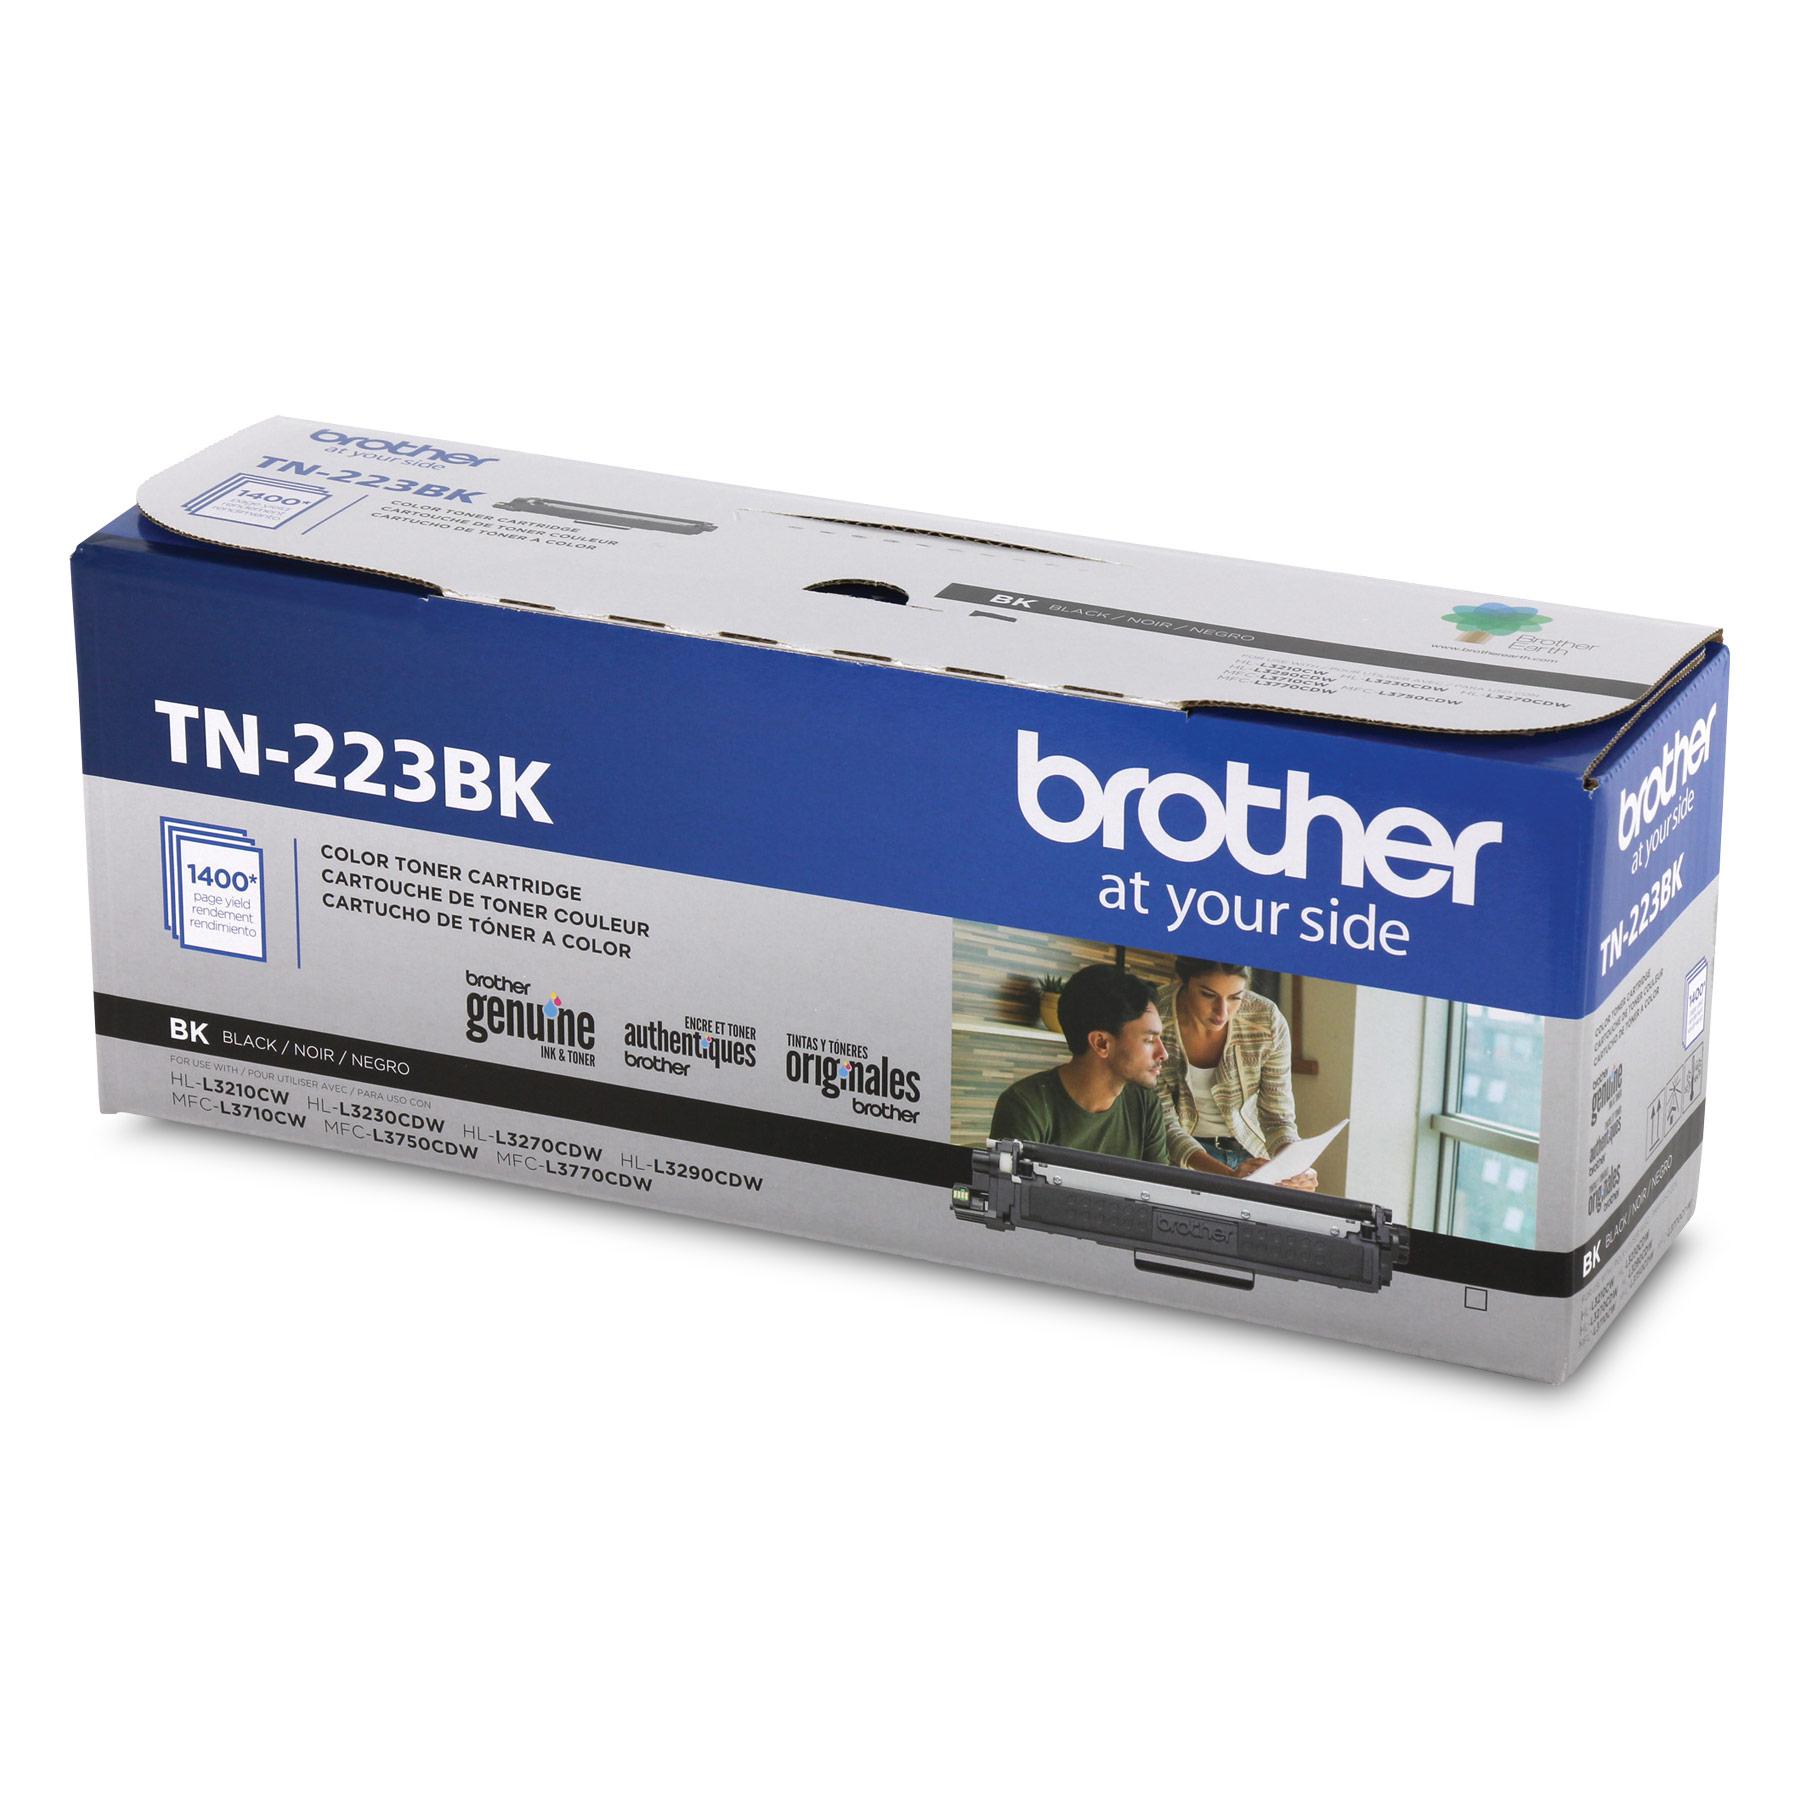 Brother TN-223BK Original Toner